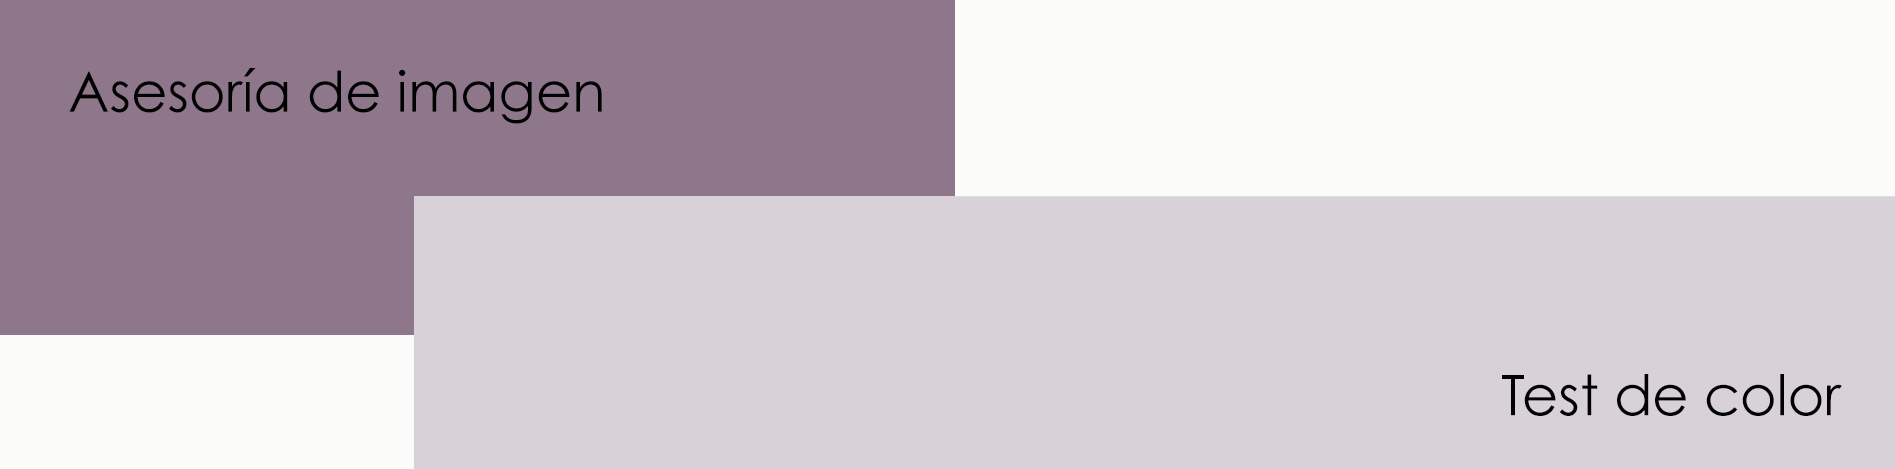 Asesoria de imagen - Test de color